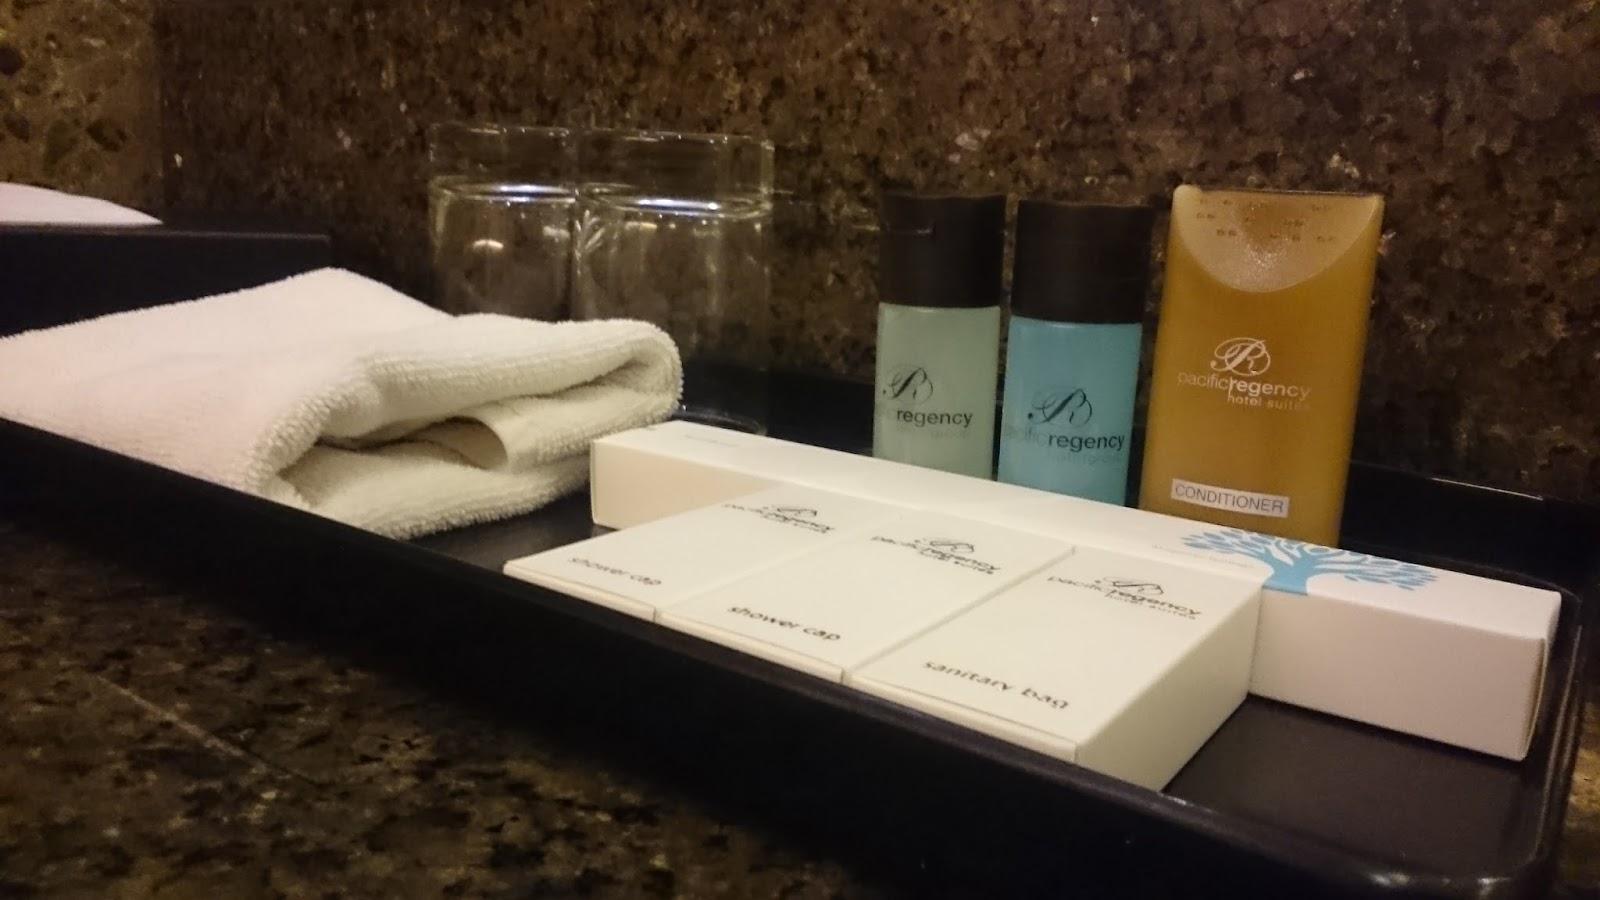 Siapa Ambil Botol Shampoo, Conditioner & Sabun Dari Hotel?